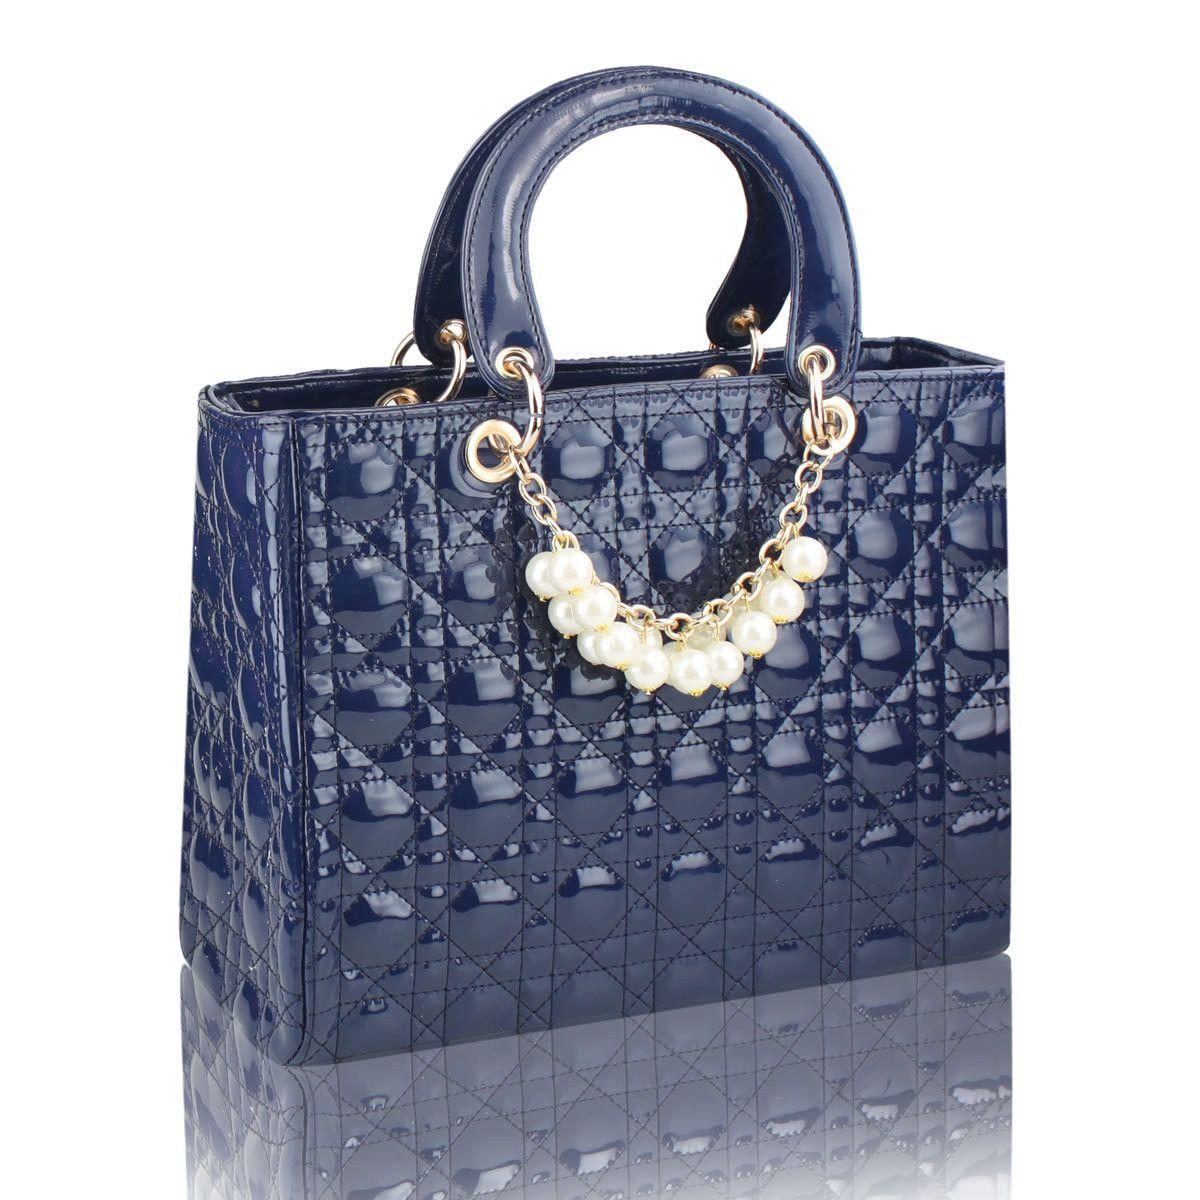 Sunny Women S Handbag Plaid Fashion Bridal Bag Wedding Party Beading Shoulder Pu Leather